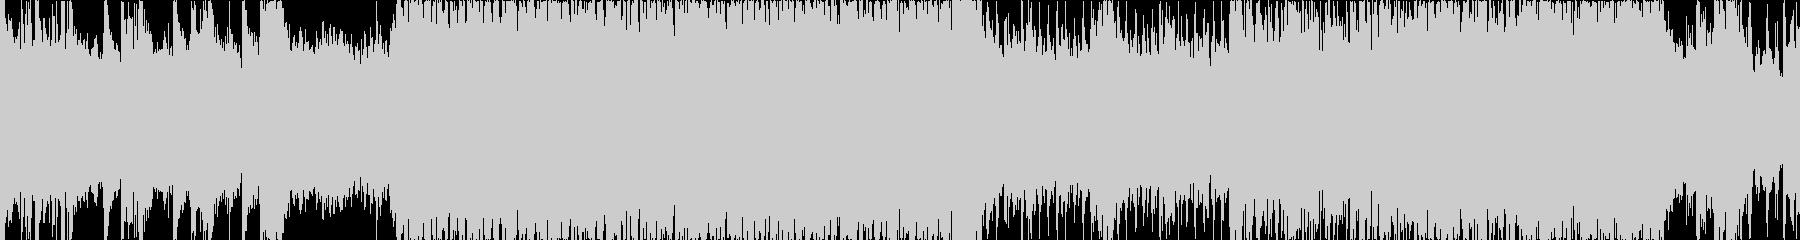 BGM/ゲーム向け/バトル/ボスバトルの未再生の波形